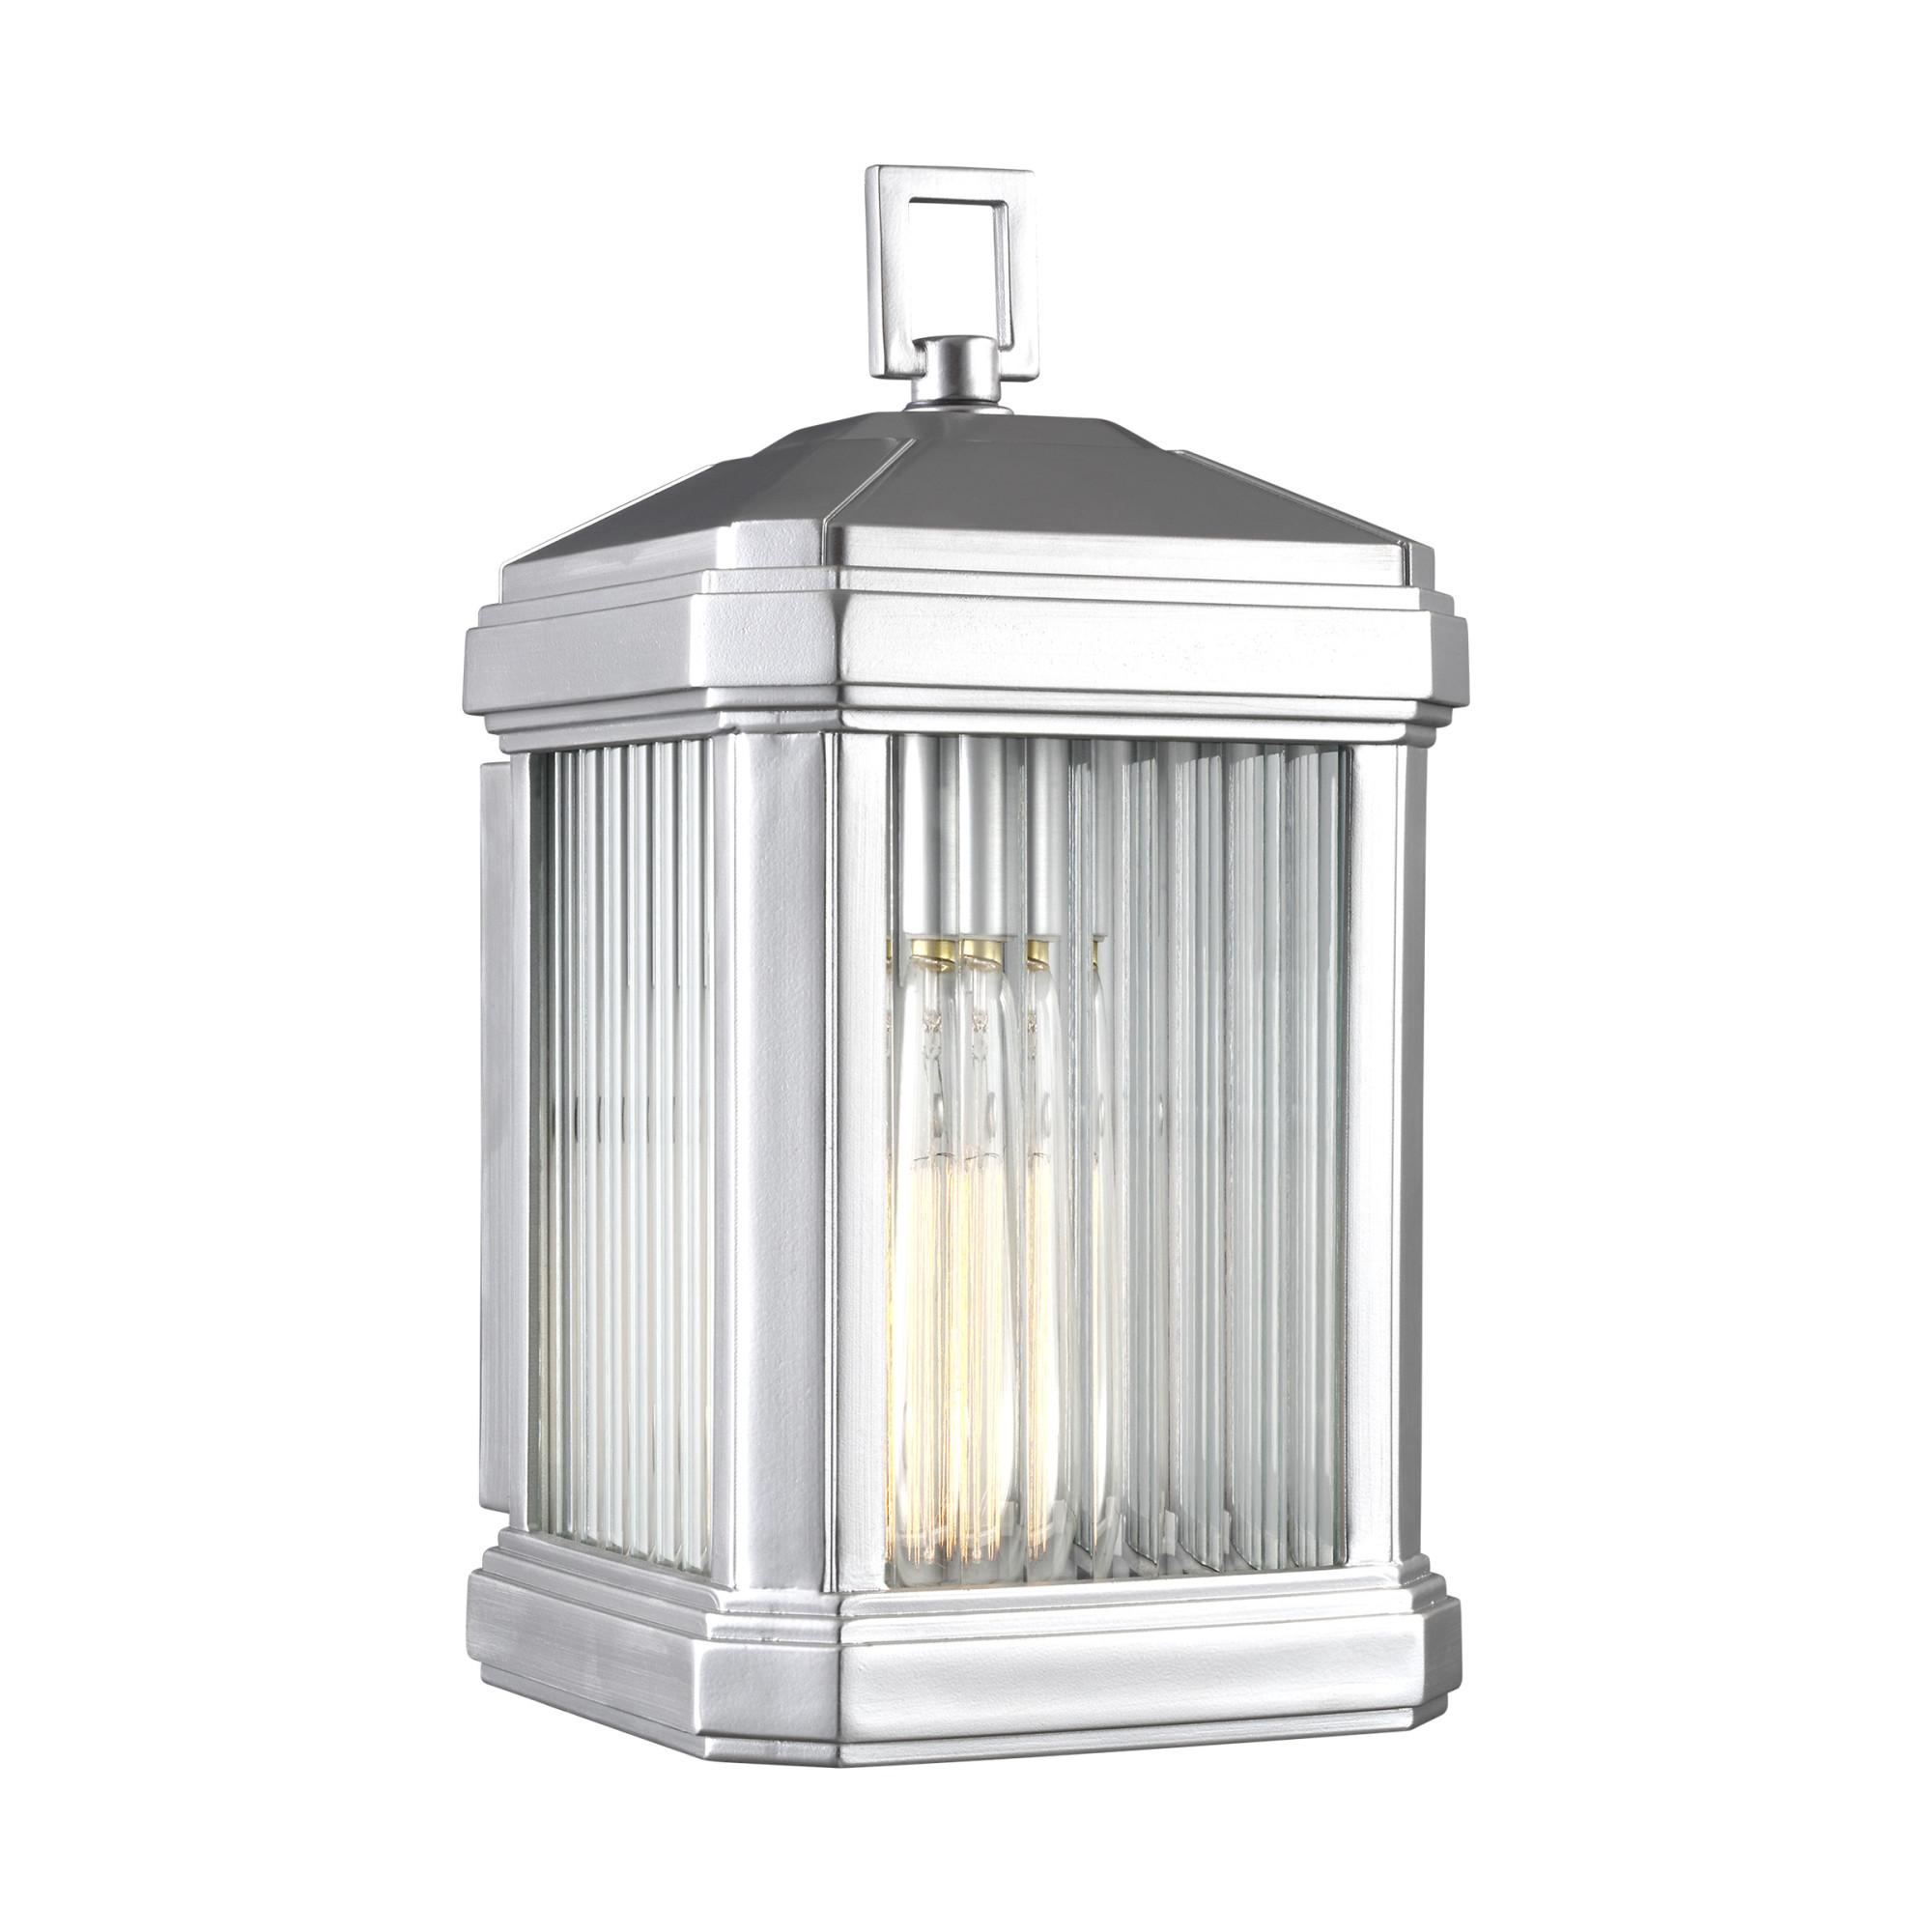 "Sea Gull Lighting 8647431EN3 Gaelan Single Light 14-1/4"" Tall LED Outdoor Wall Sconce"